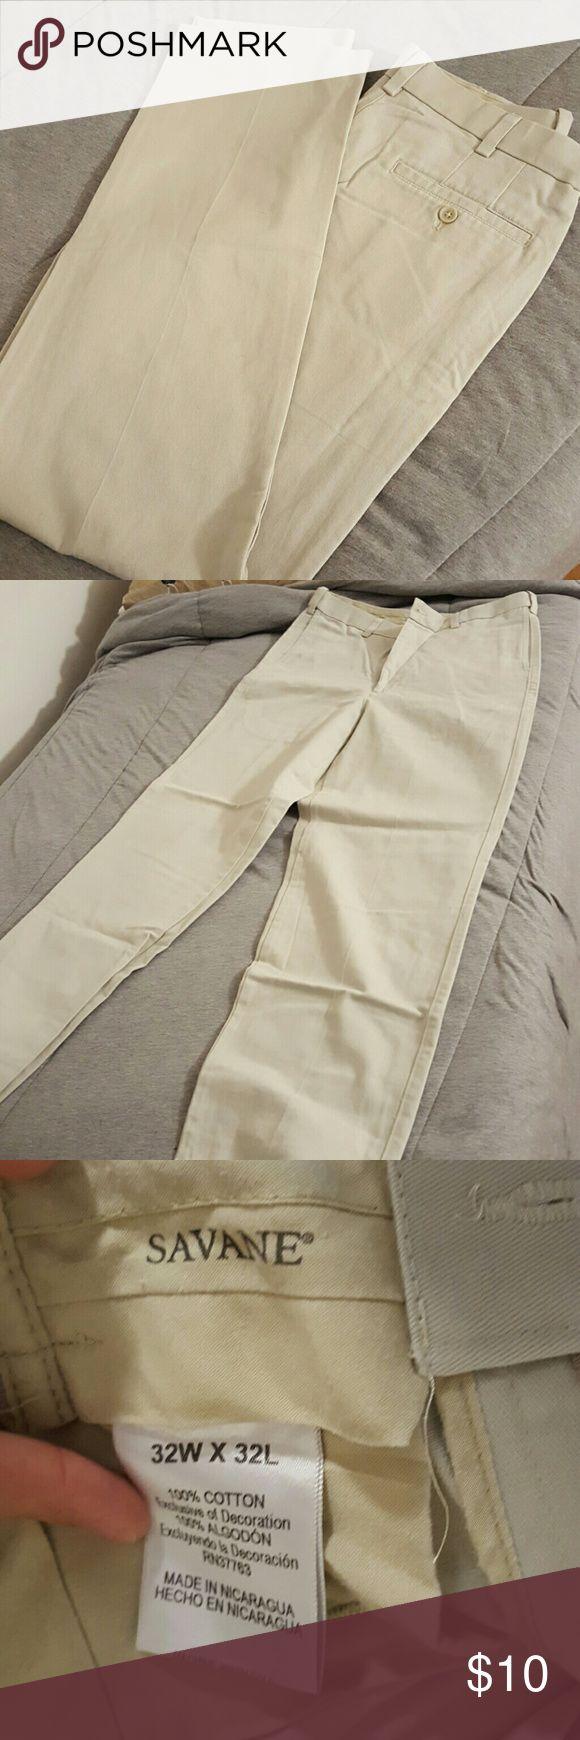 Savane Pleated Pants like new condition, gently worn. no stains Savane Pants Dress